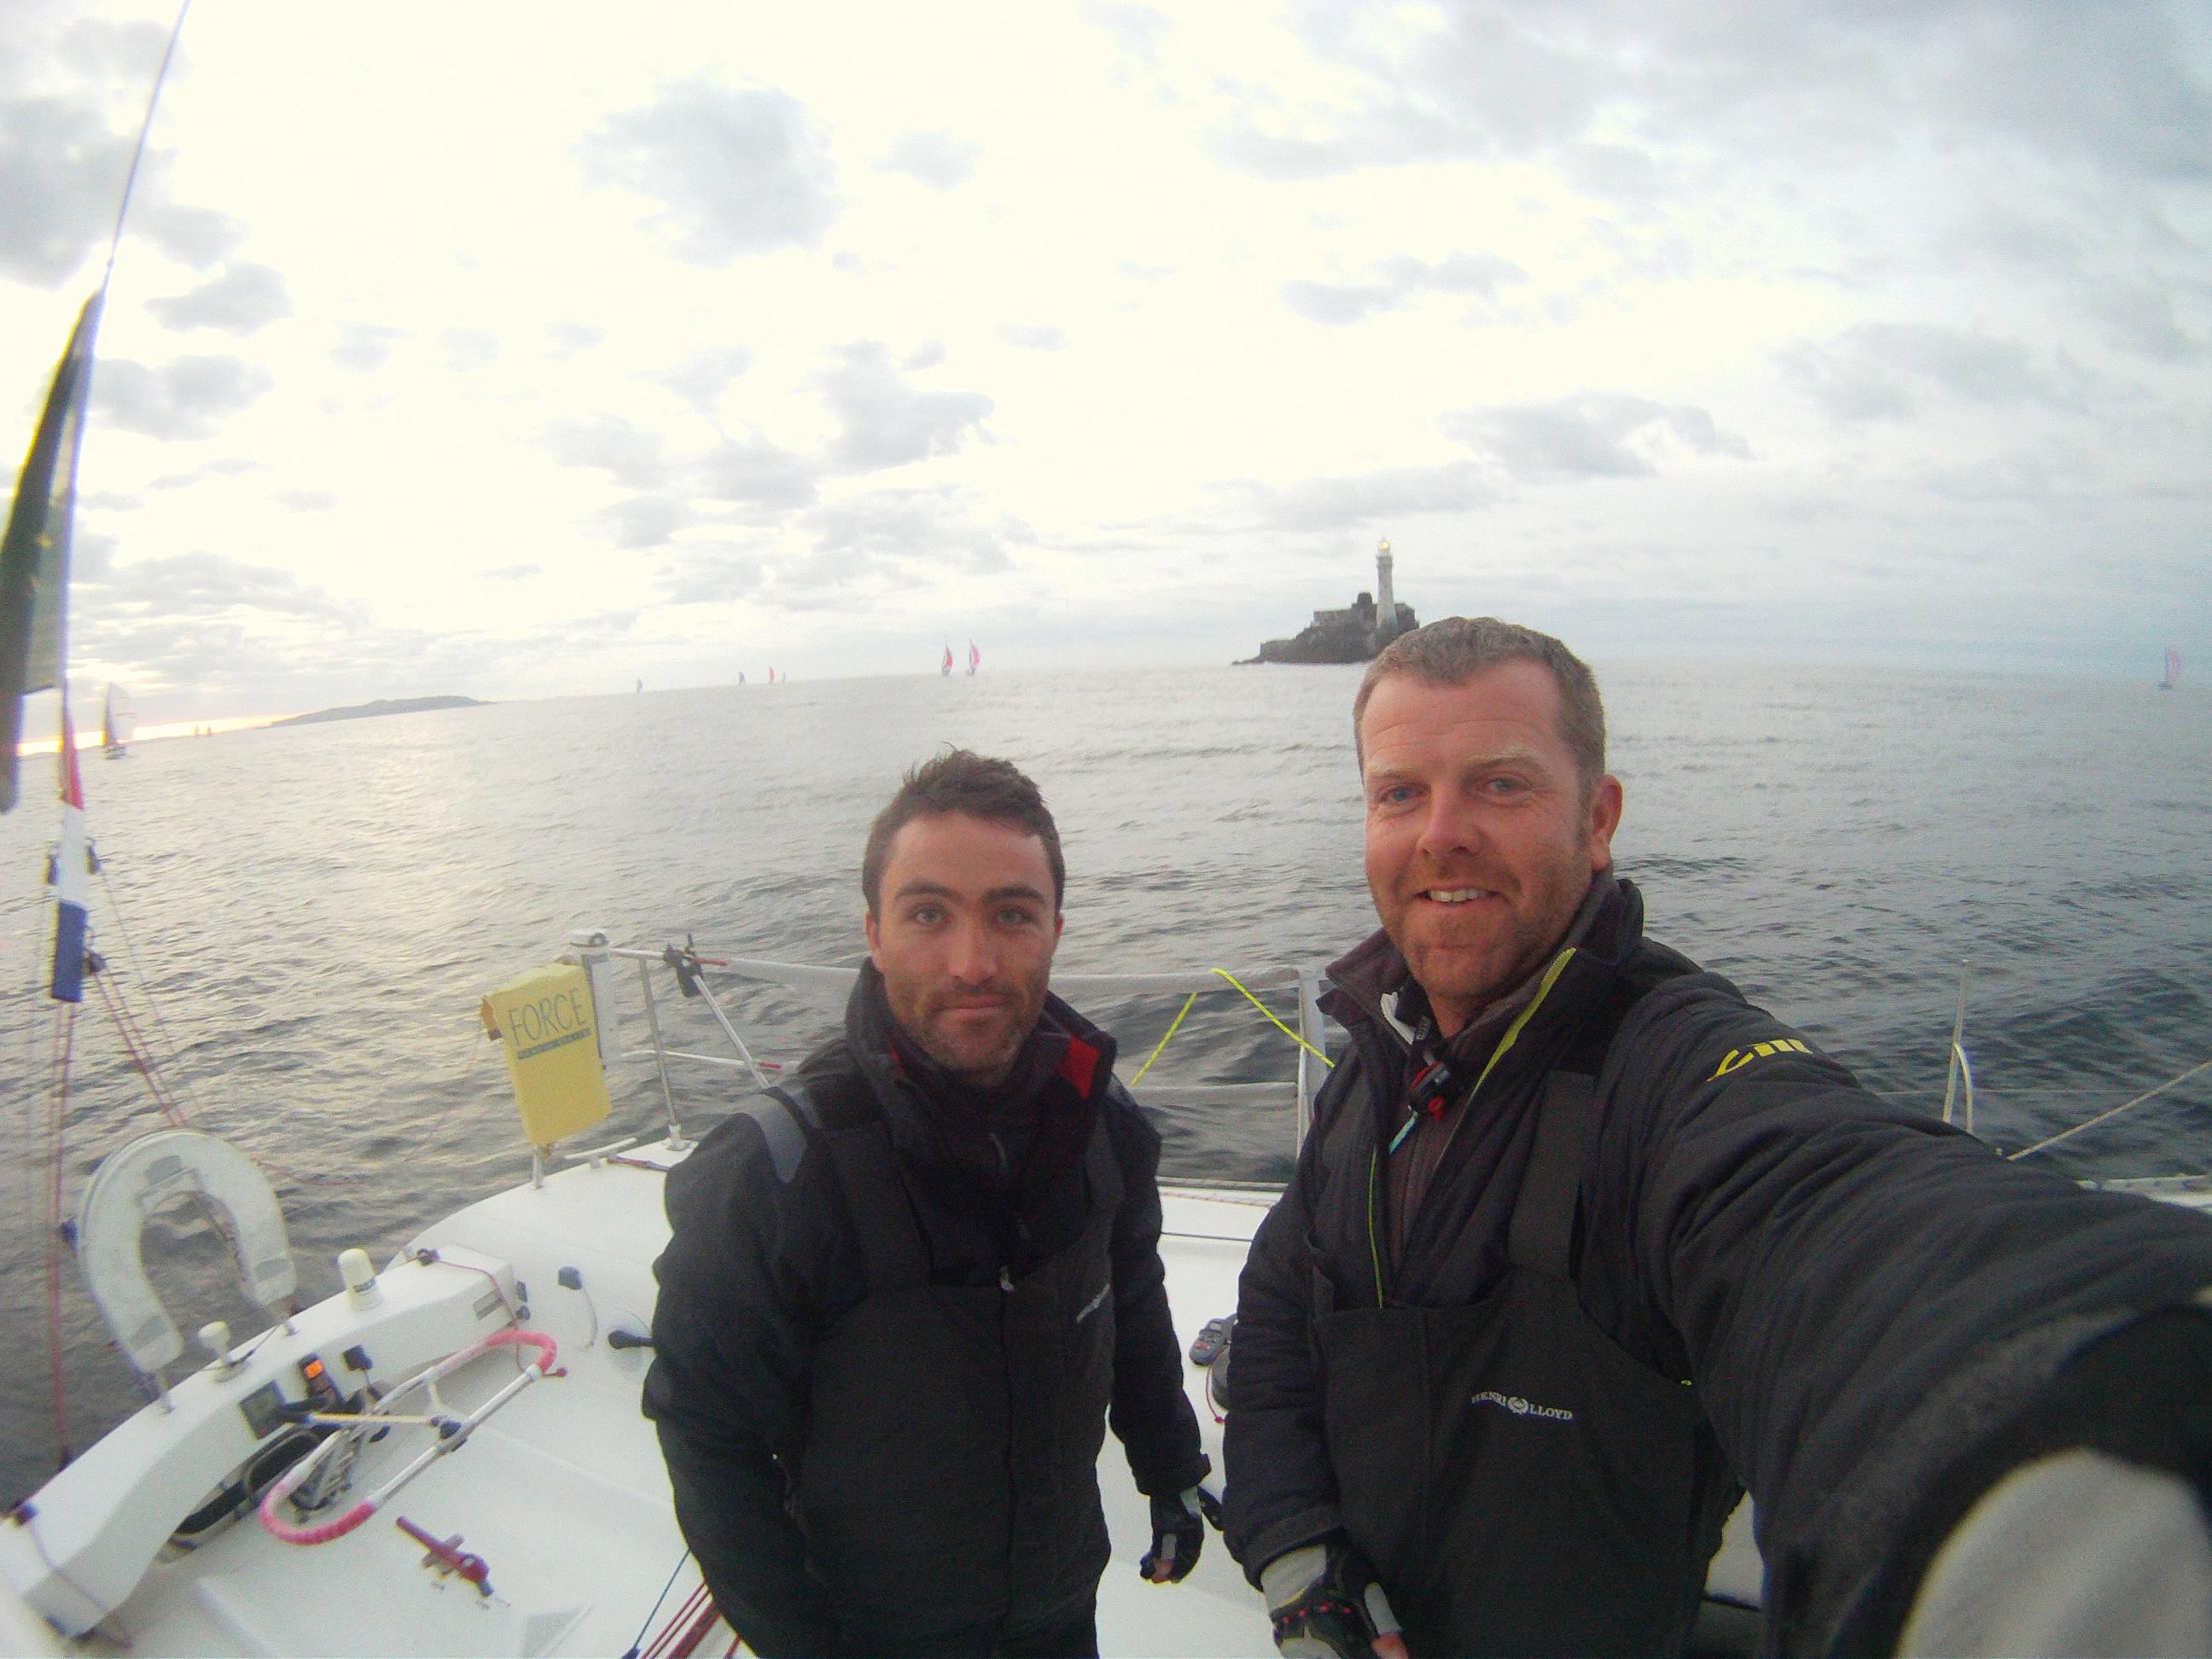 http://www.dinah.sail.ie/wp-content/uploads/2012/04/GOPR8519.jpg